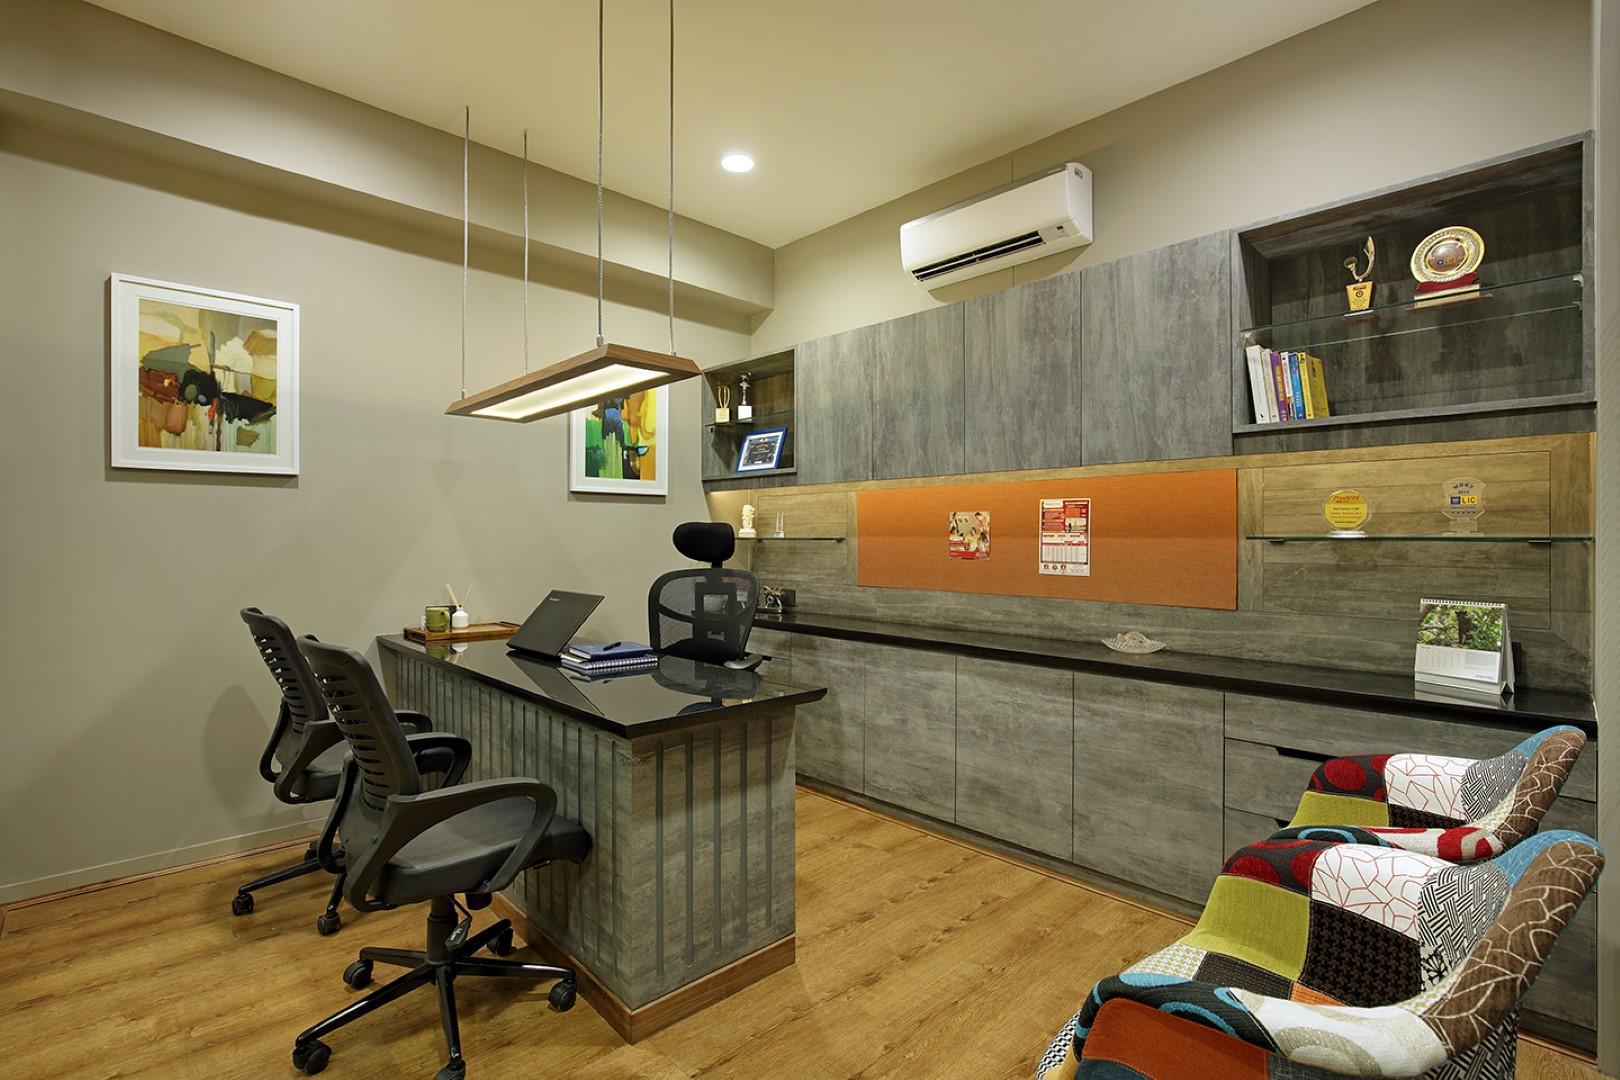 Corporate Office Interior Breaks the Monotony and Boring Environment | M S Design Studio & Corporate Office Interior Breaks the Monotony and Boring Environment ...